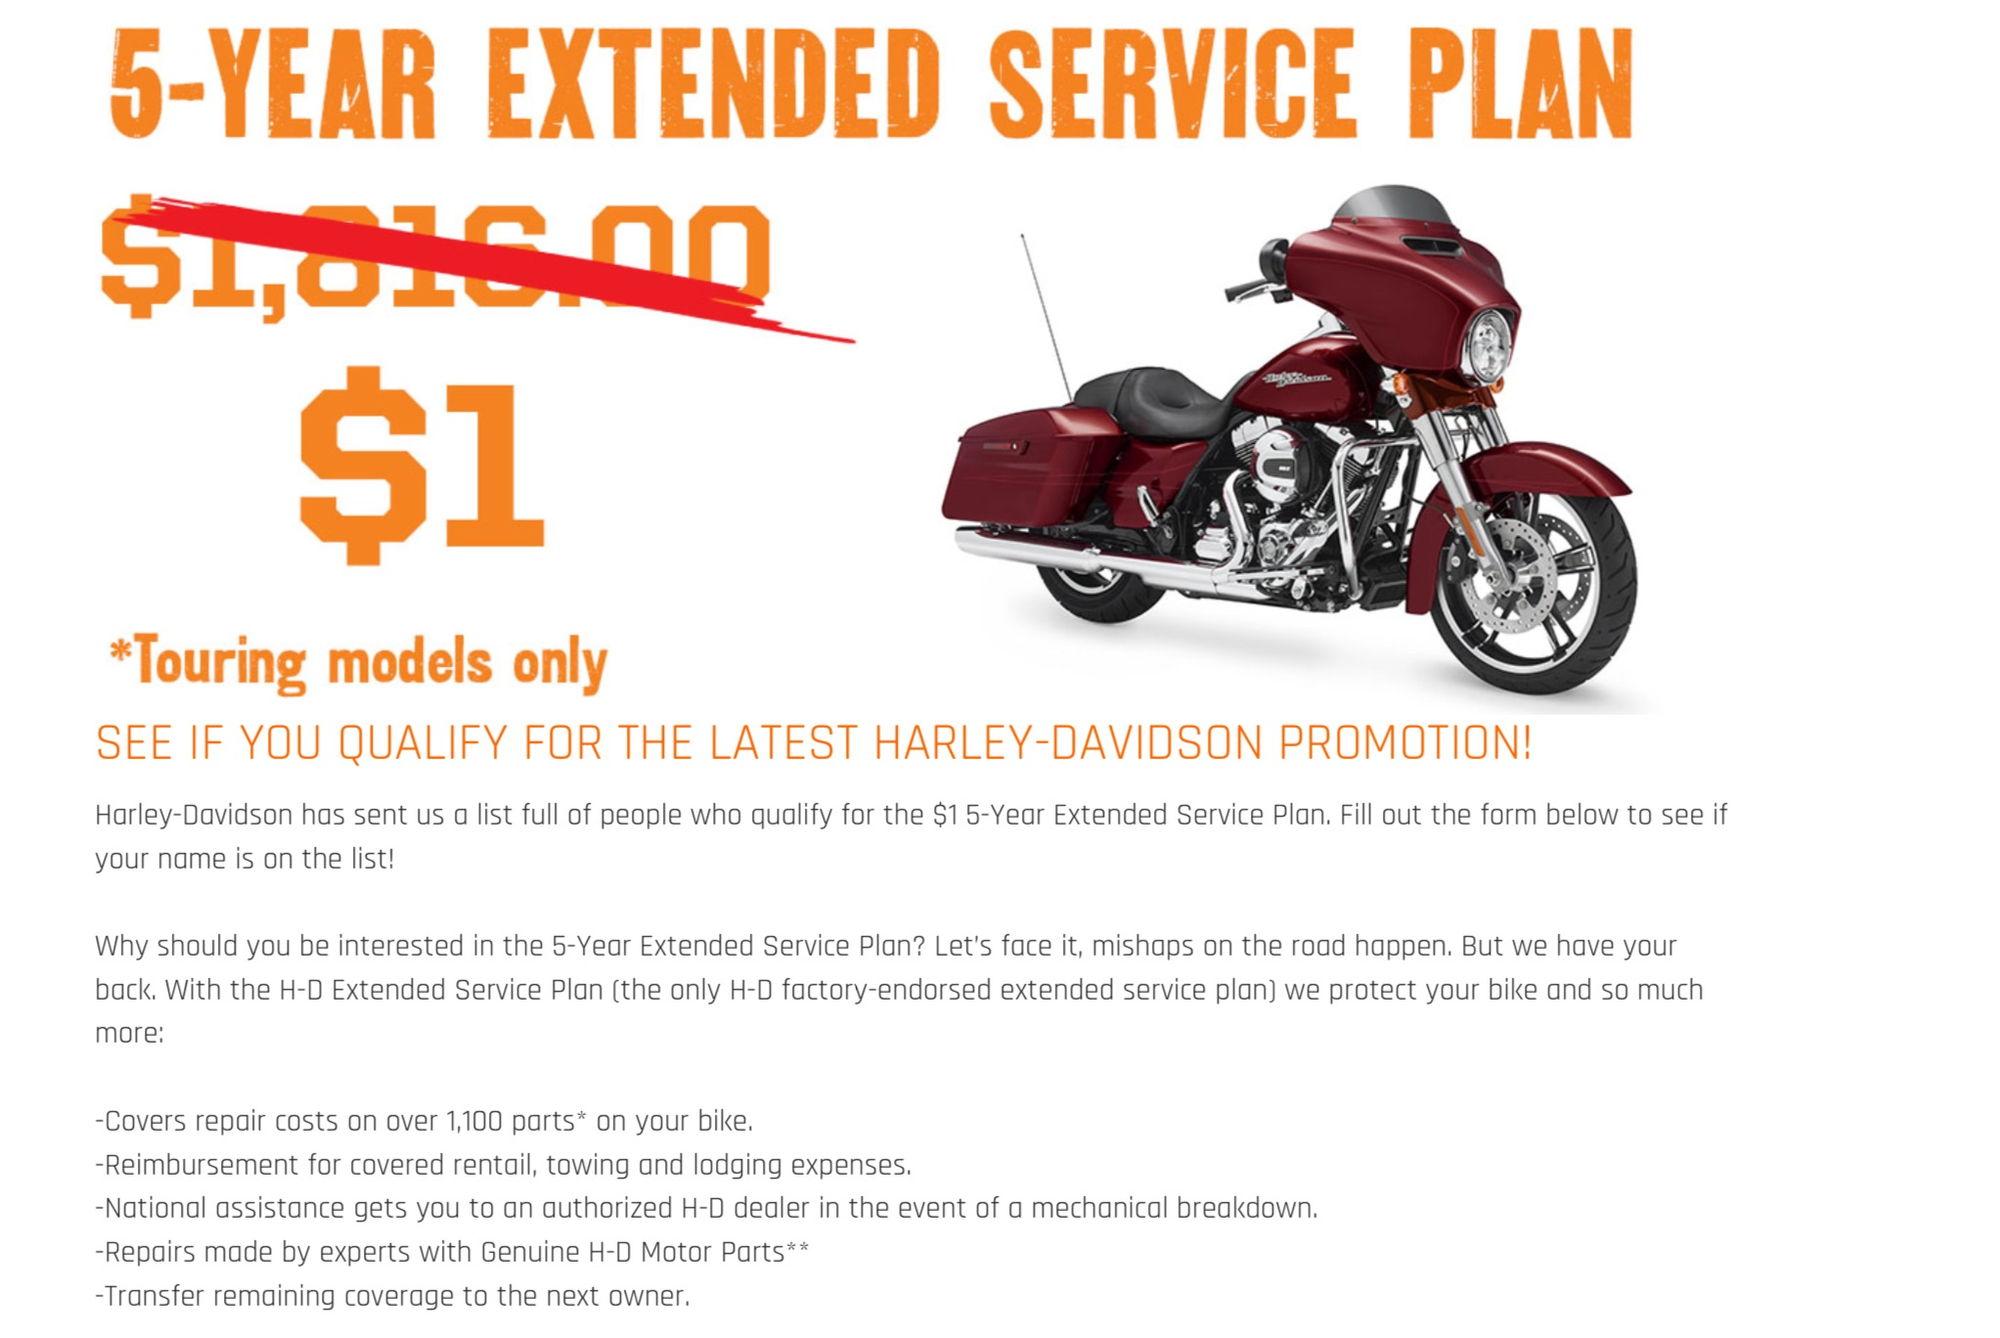 1$ extended service plan - harley davidson forums